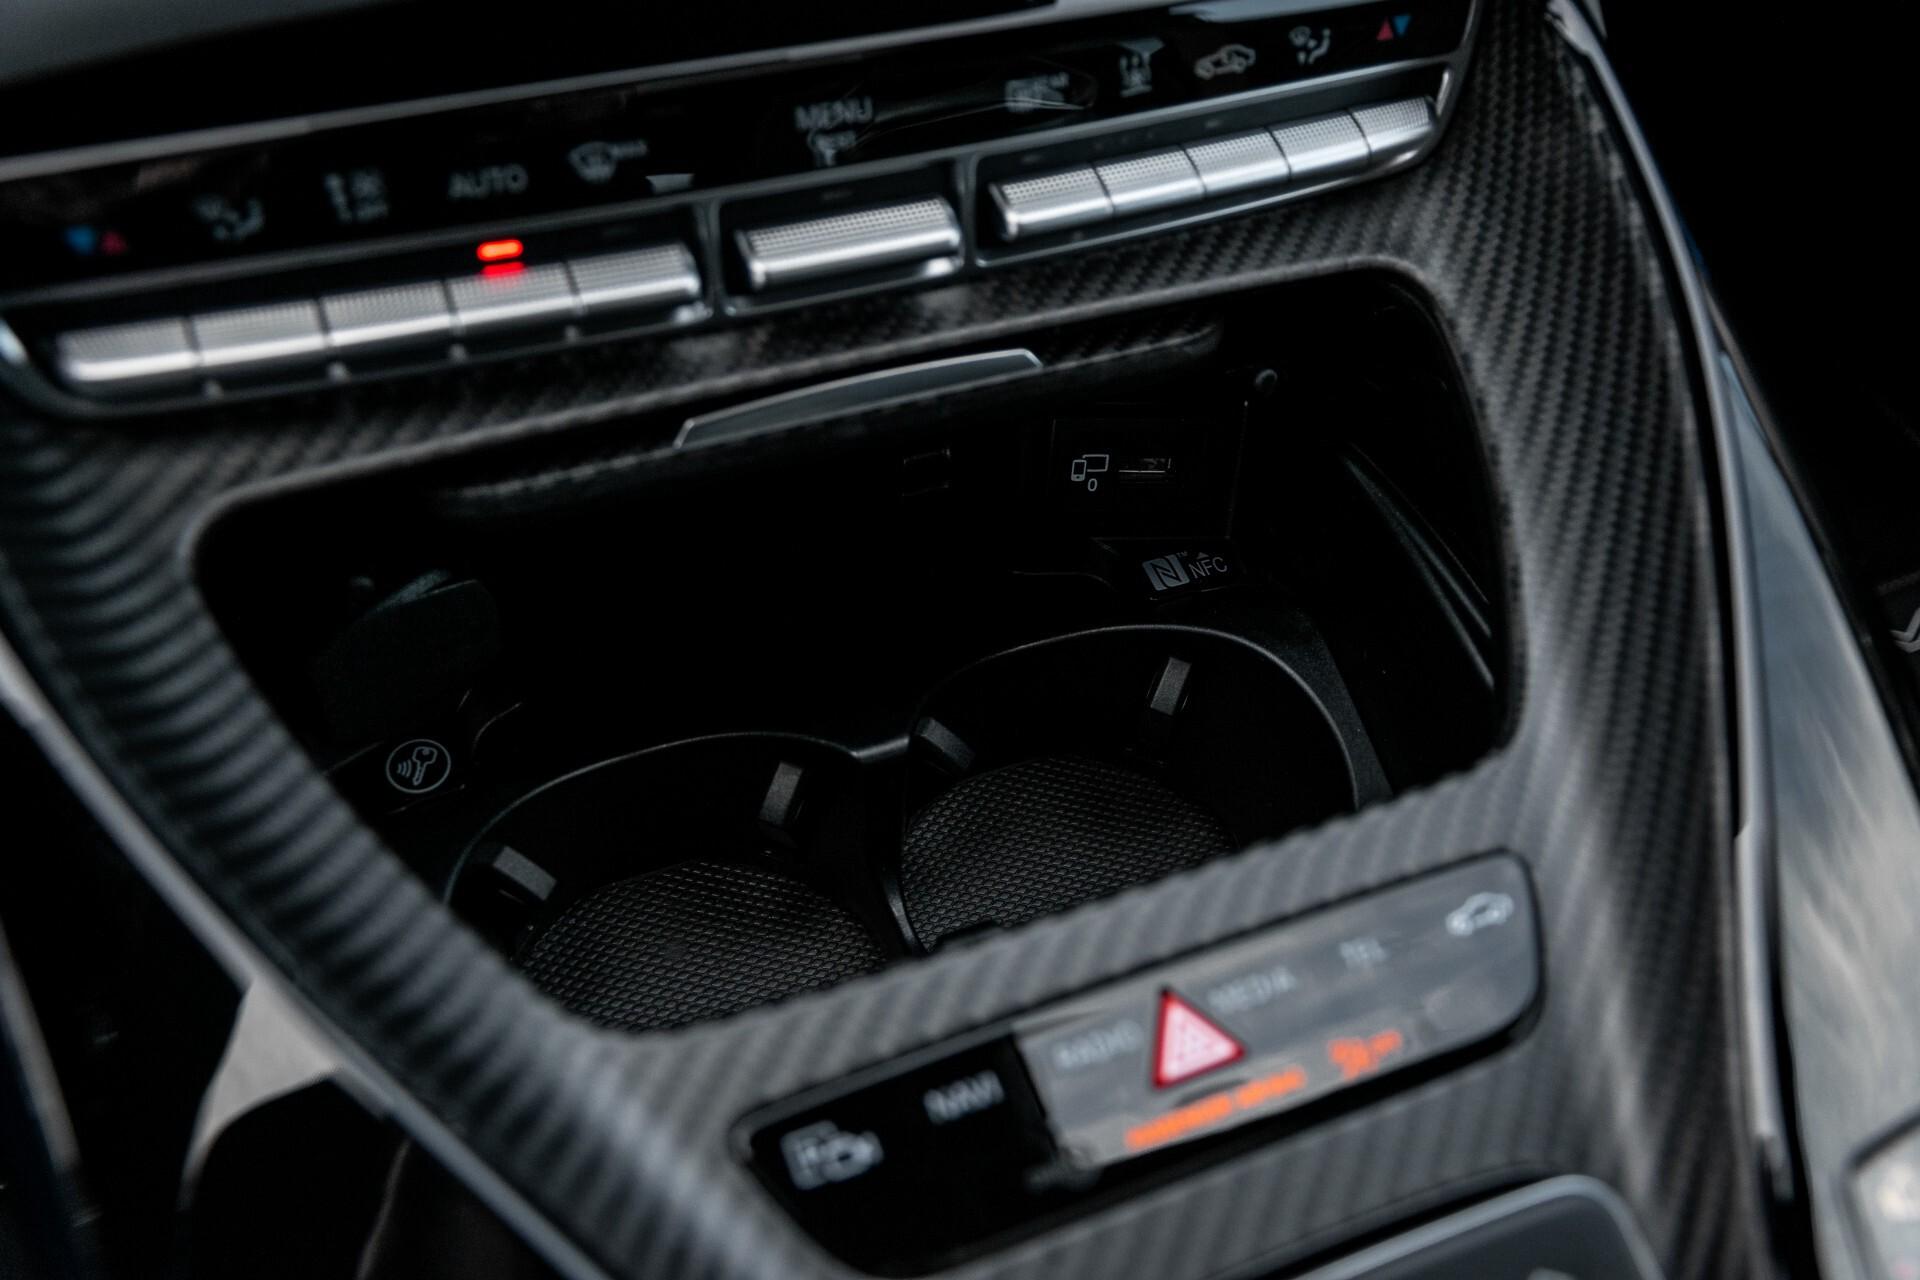 Mercedes-Benz AMG GT 4-Door Coupe 63 S 4MATIC+ Edition 1 Keramisch/Carbon/First Class/Dynamic Plus/Burmester High End 3D Aut9 Foto 53